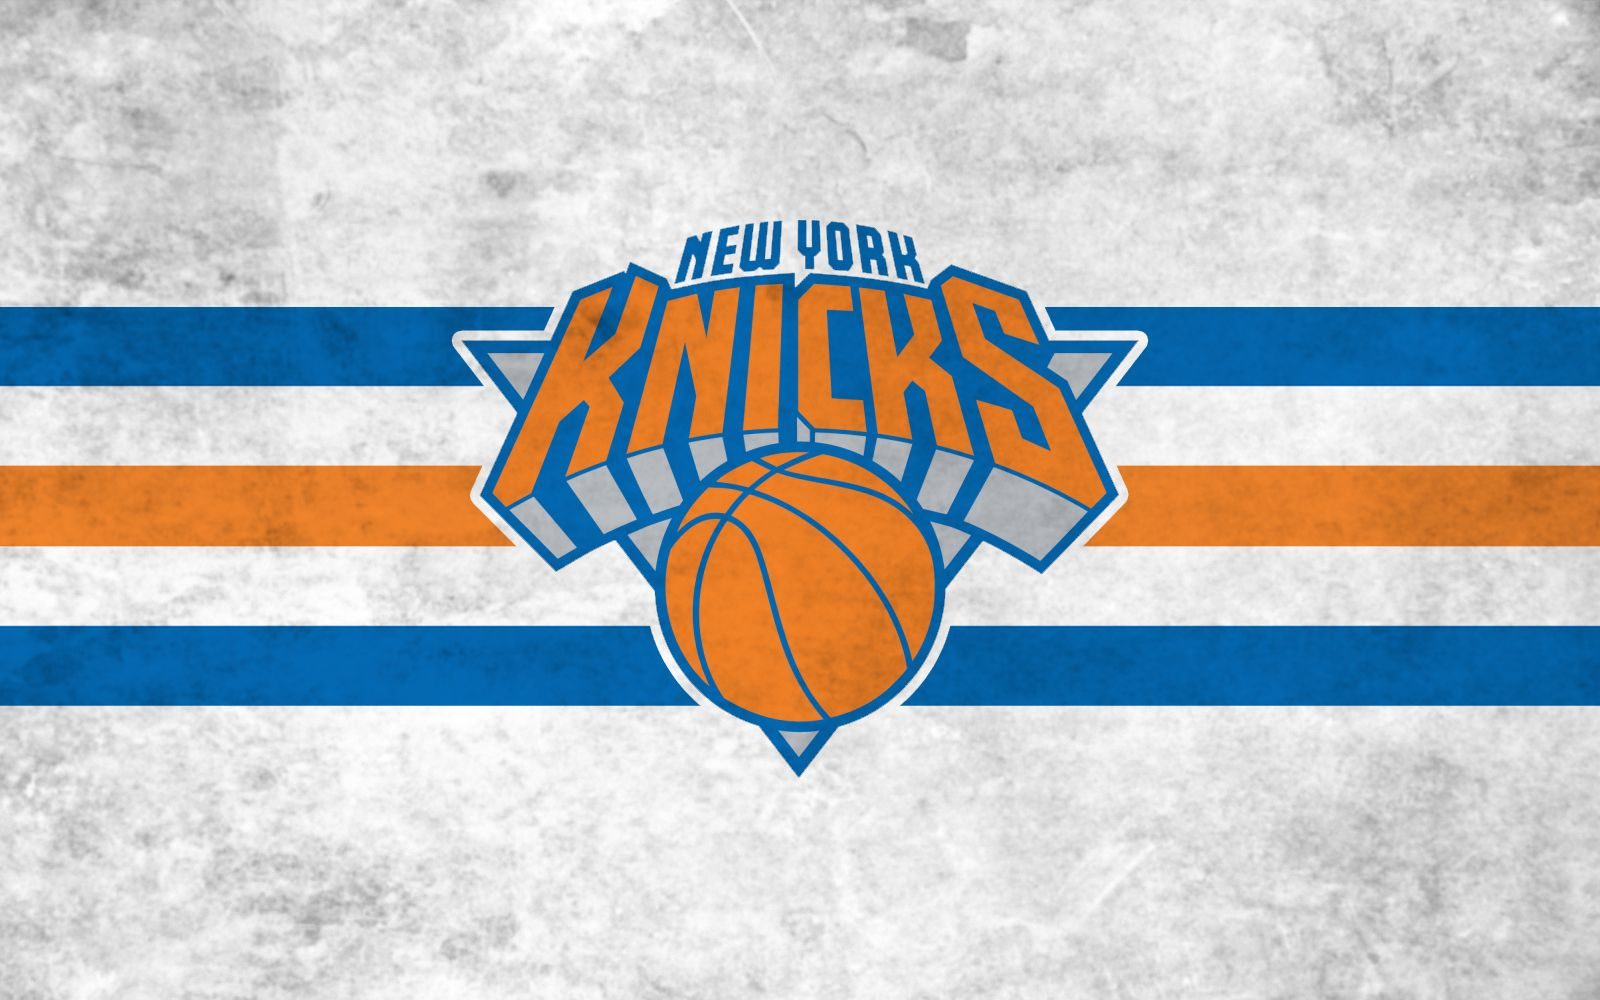 New York Knicks Hd Wallpapers Nba New York New York Knicks New